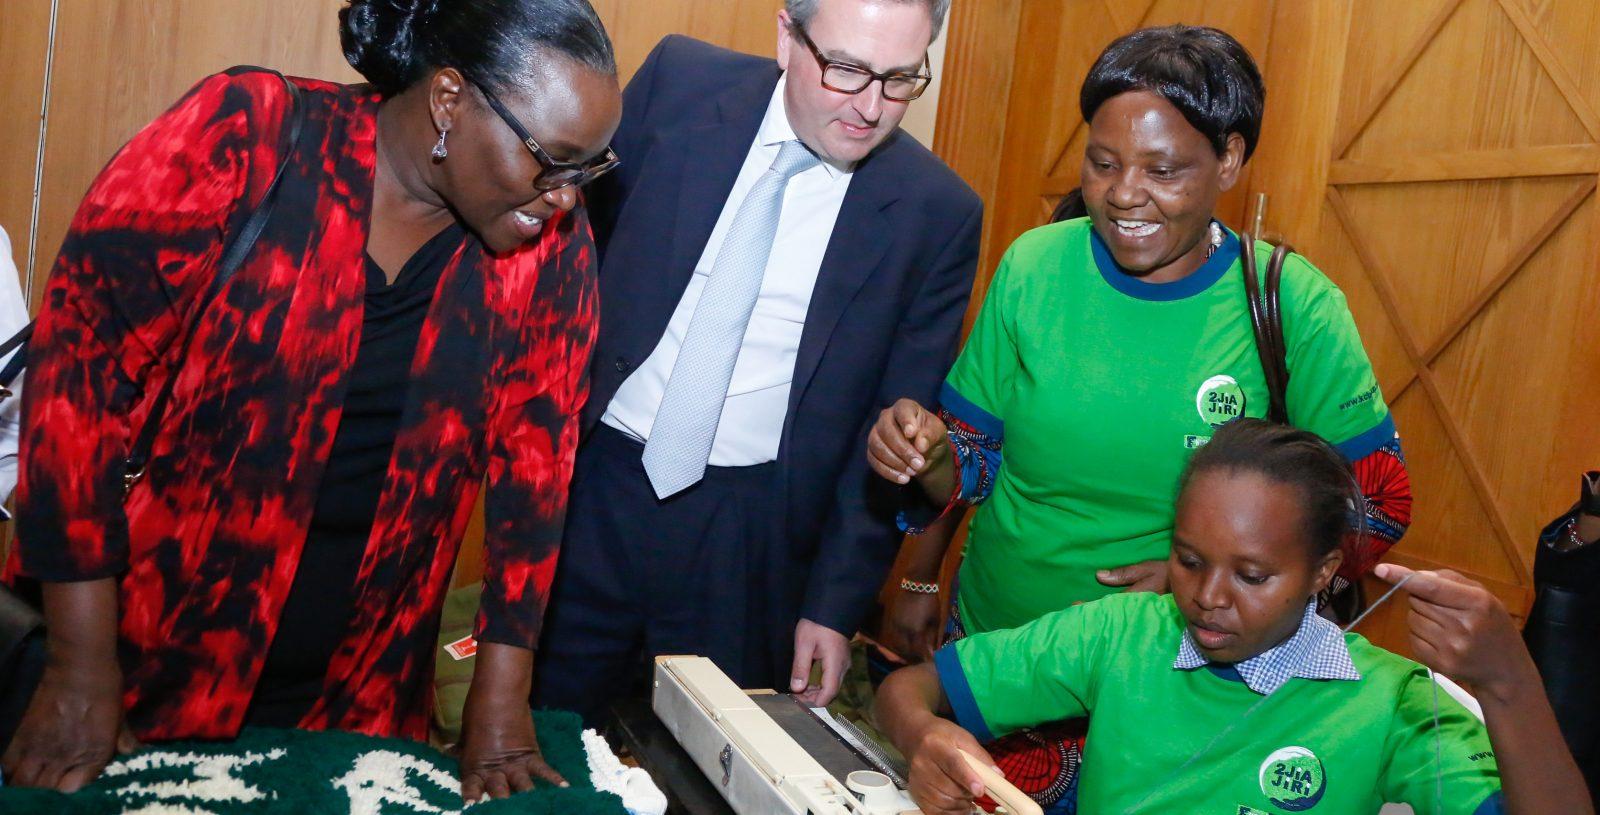 2jiajiri Taps 1,000 Persons with Disabilities